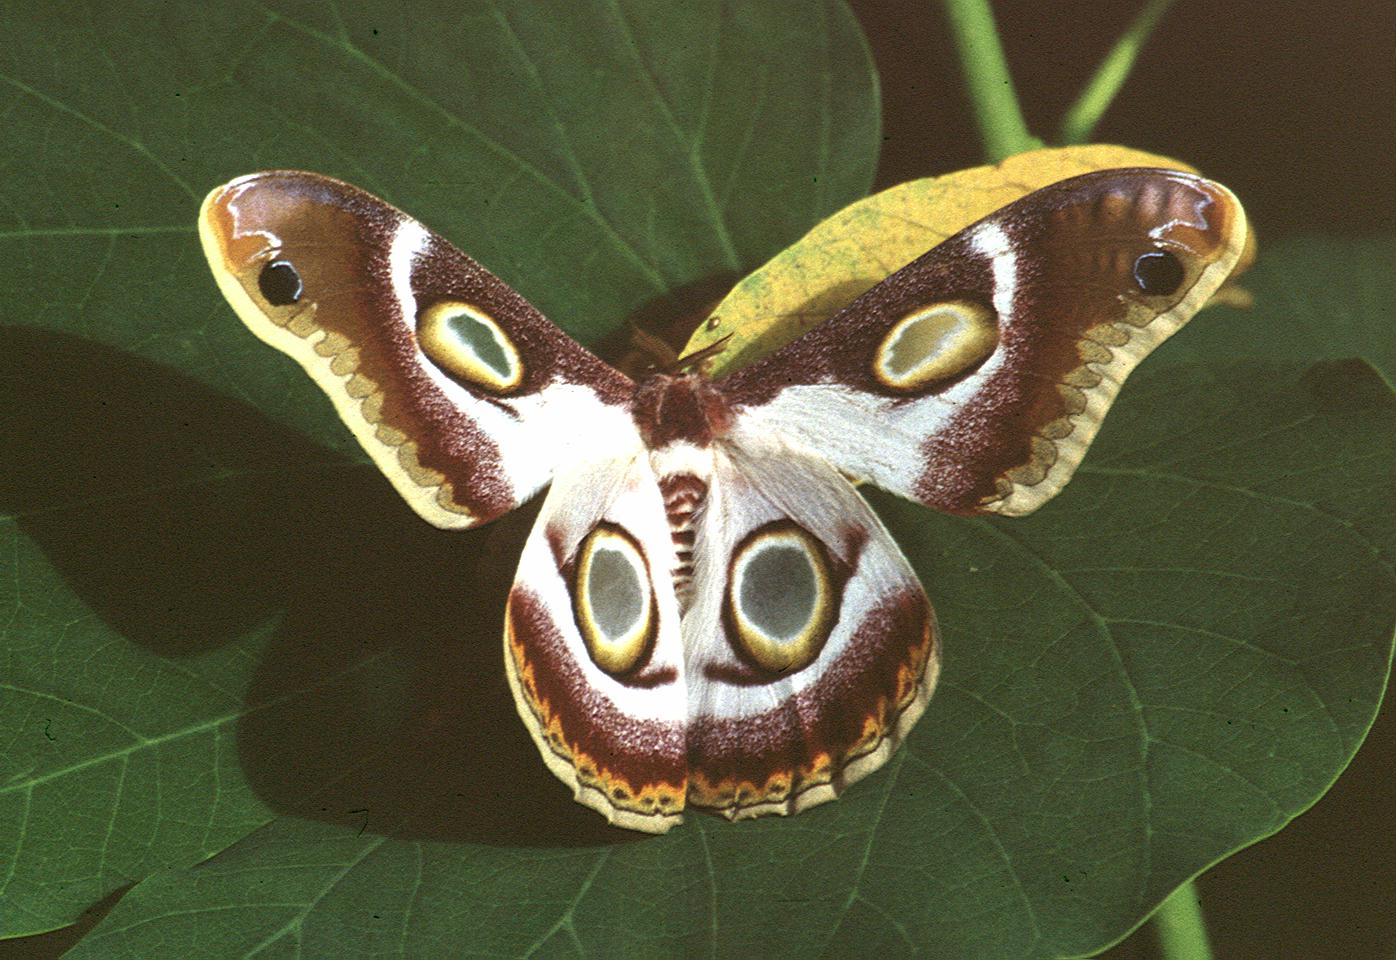 Kenya, Sigor, Butterfly